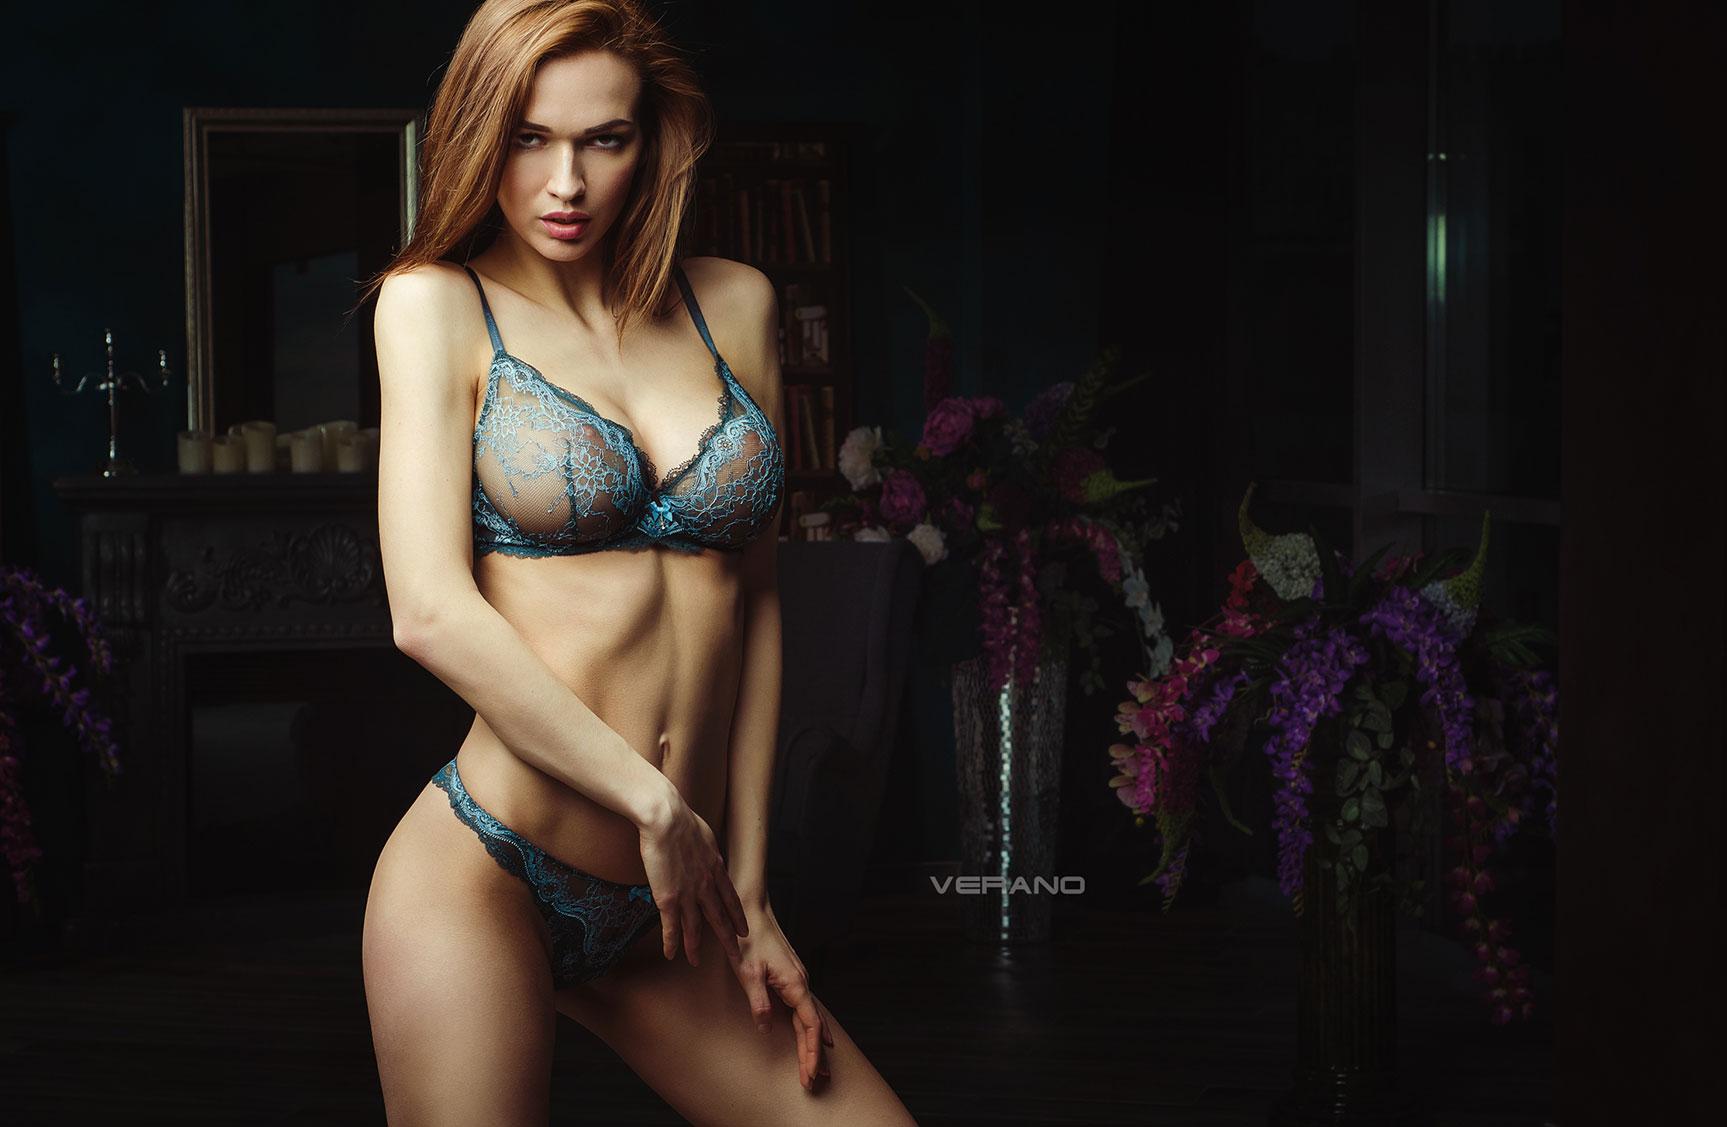 Анастасия Марципанова / Anastasia Martzipanova by Nikolas Verano